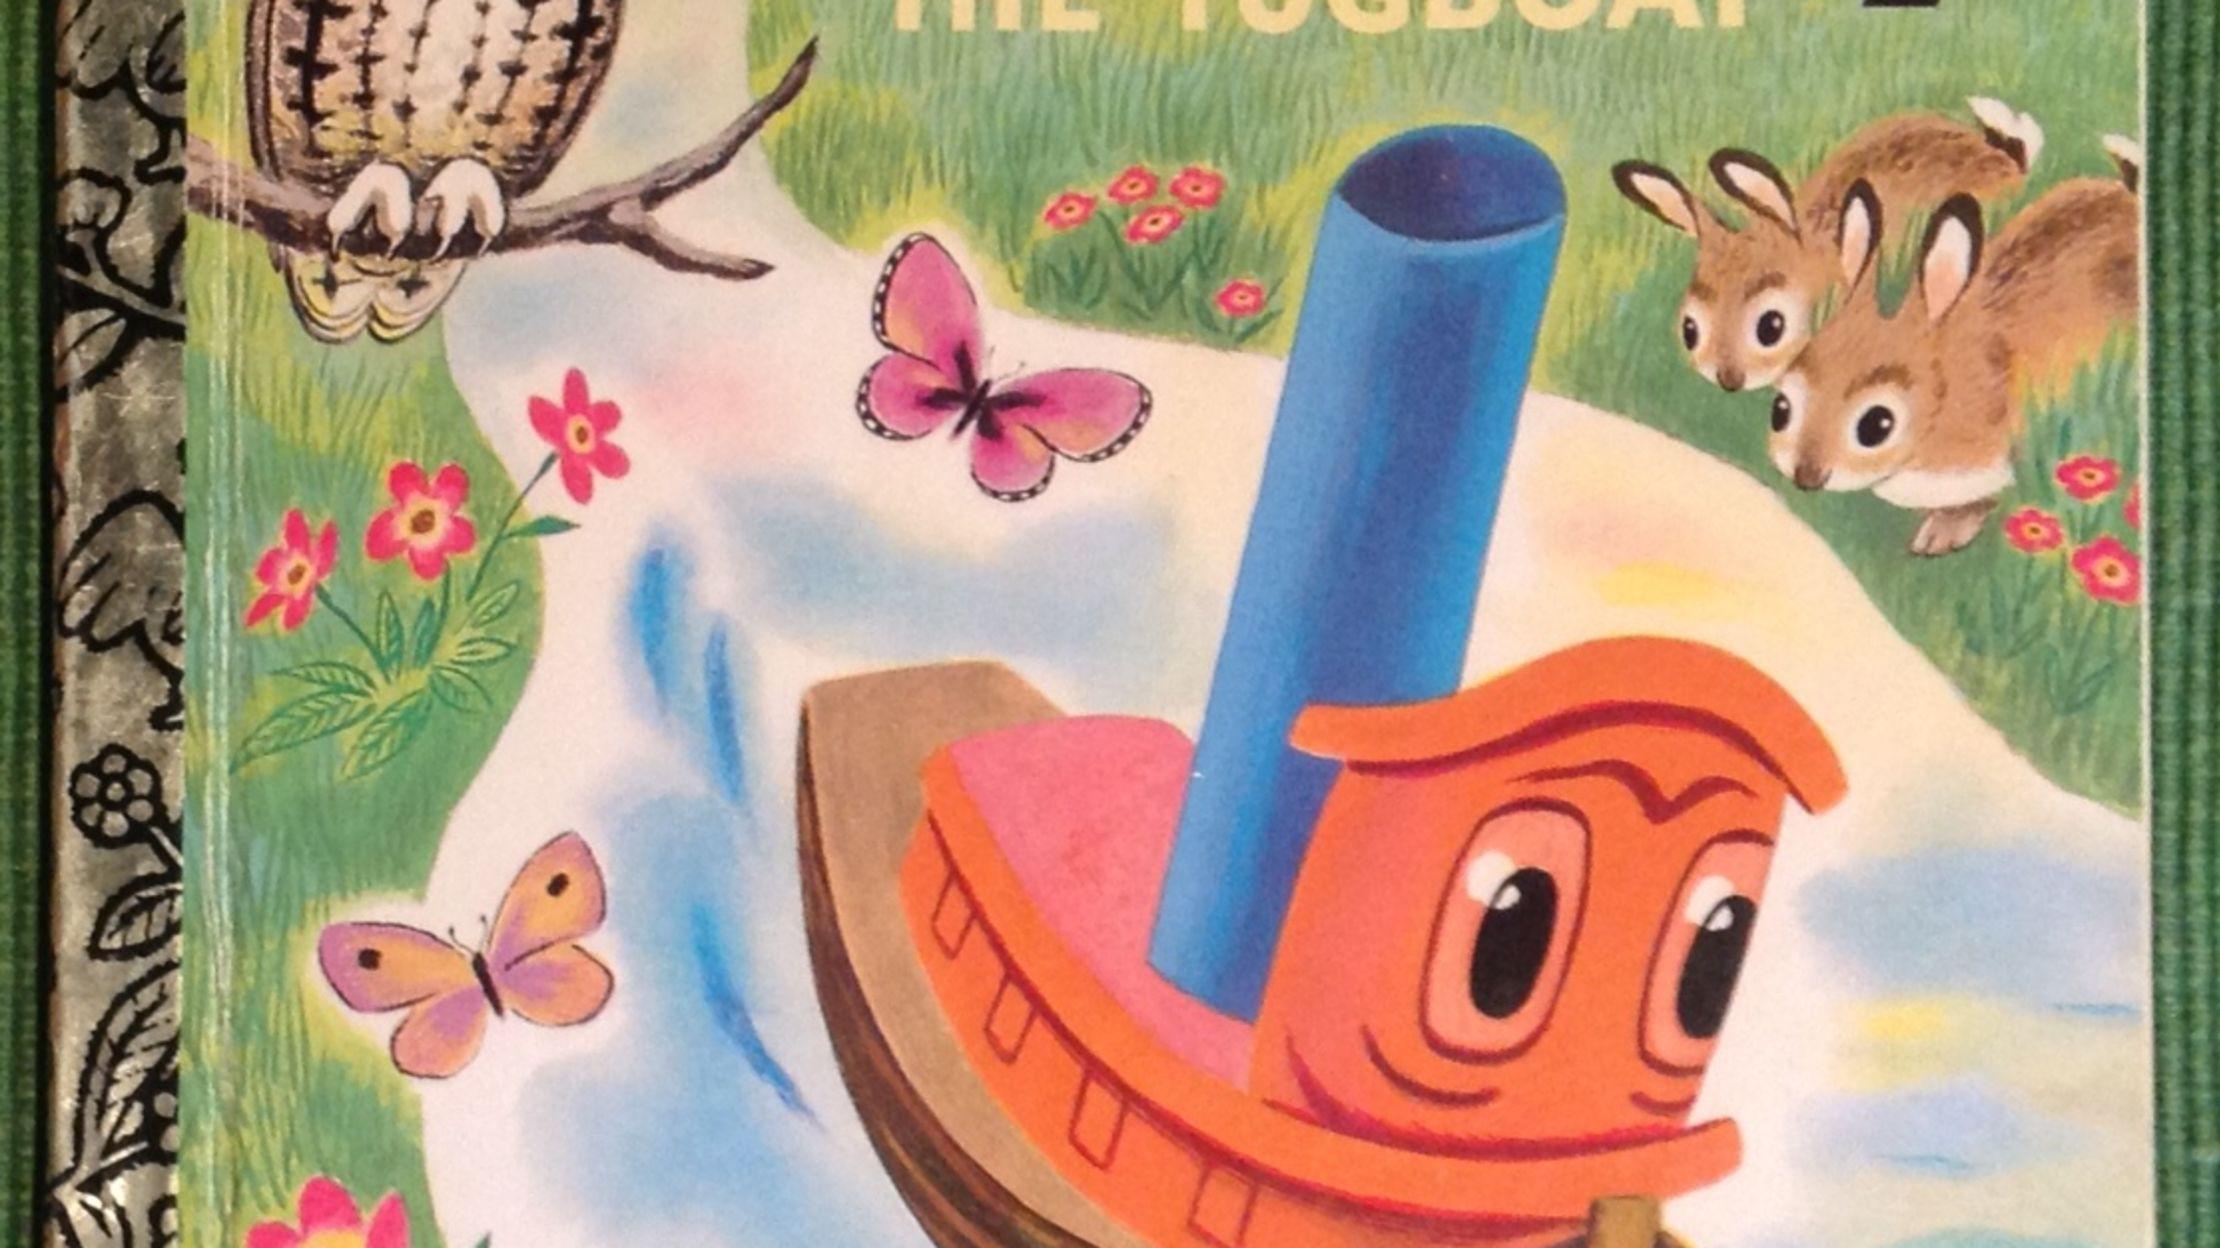 The Story Behind Little Golden Books | Mental Floss